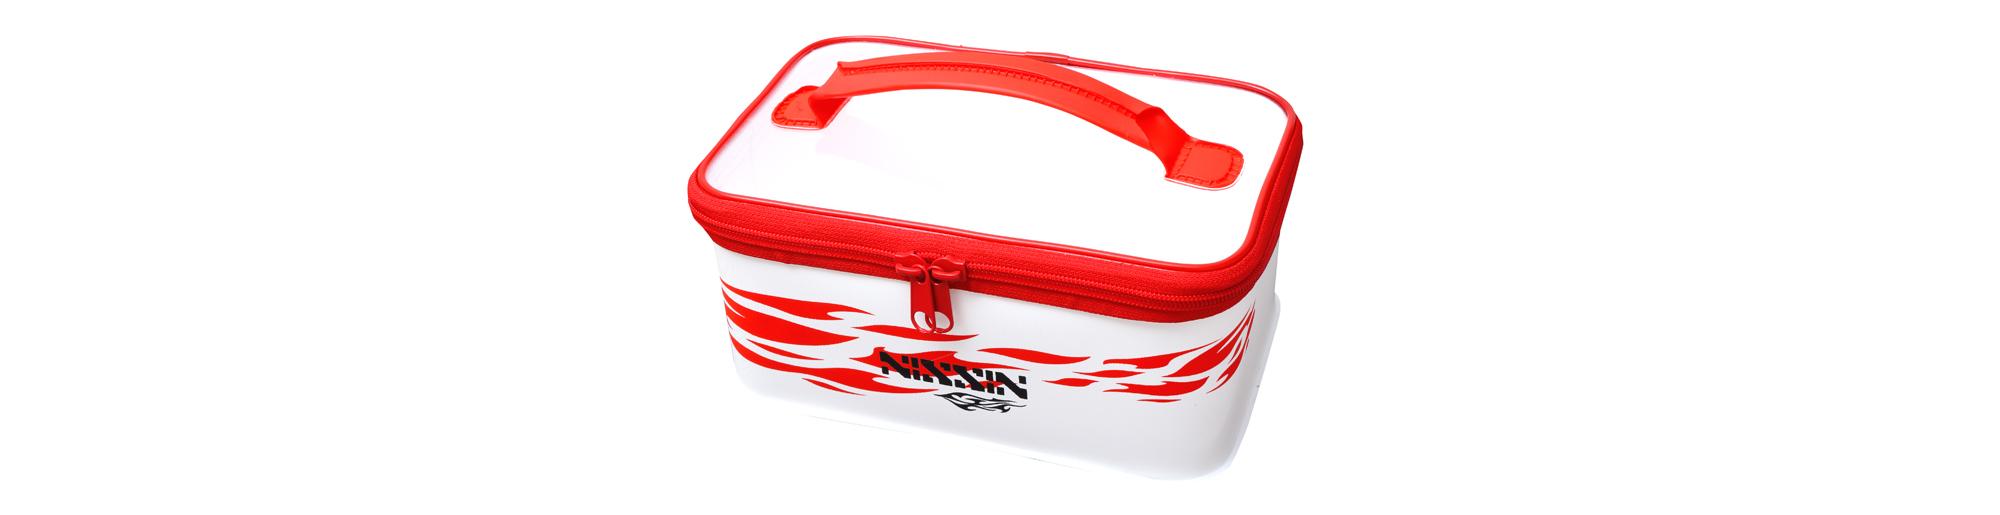 NISSINハンディーBOX W-R